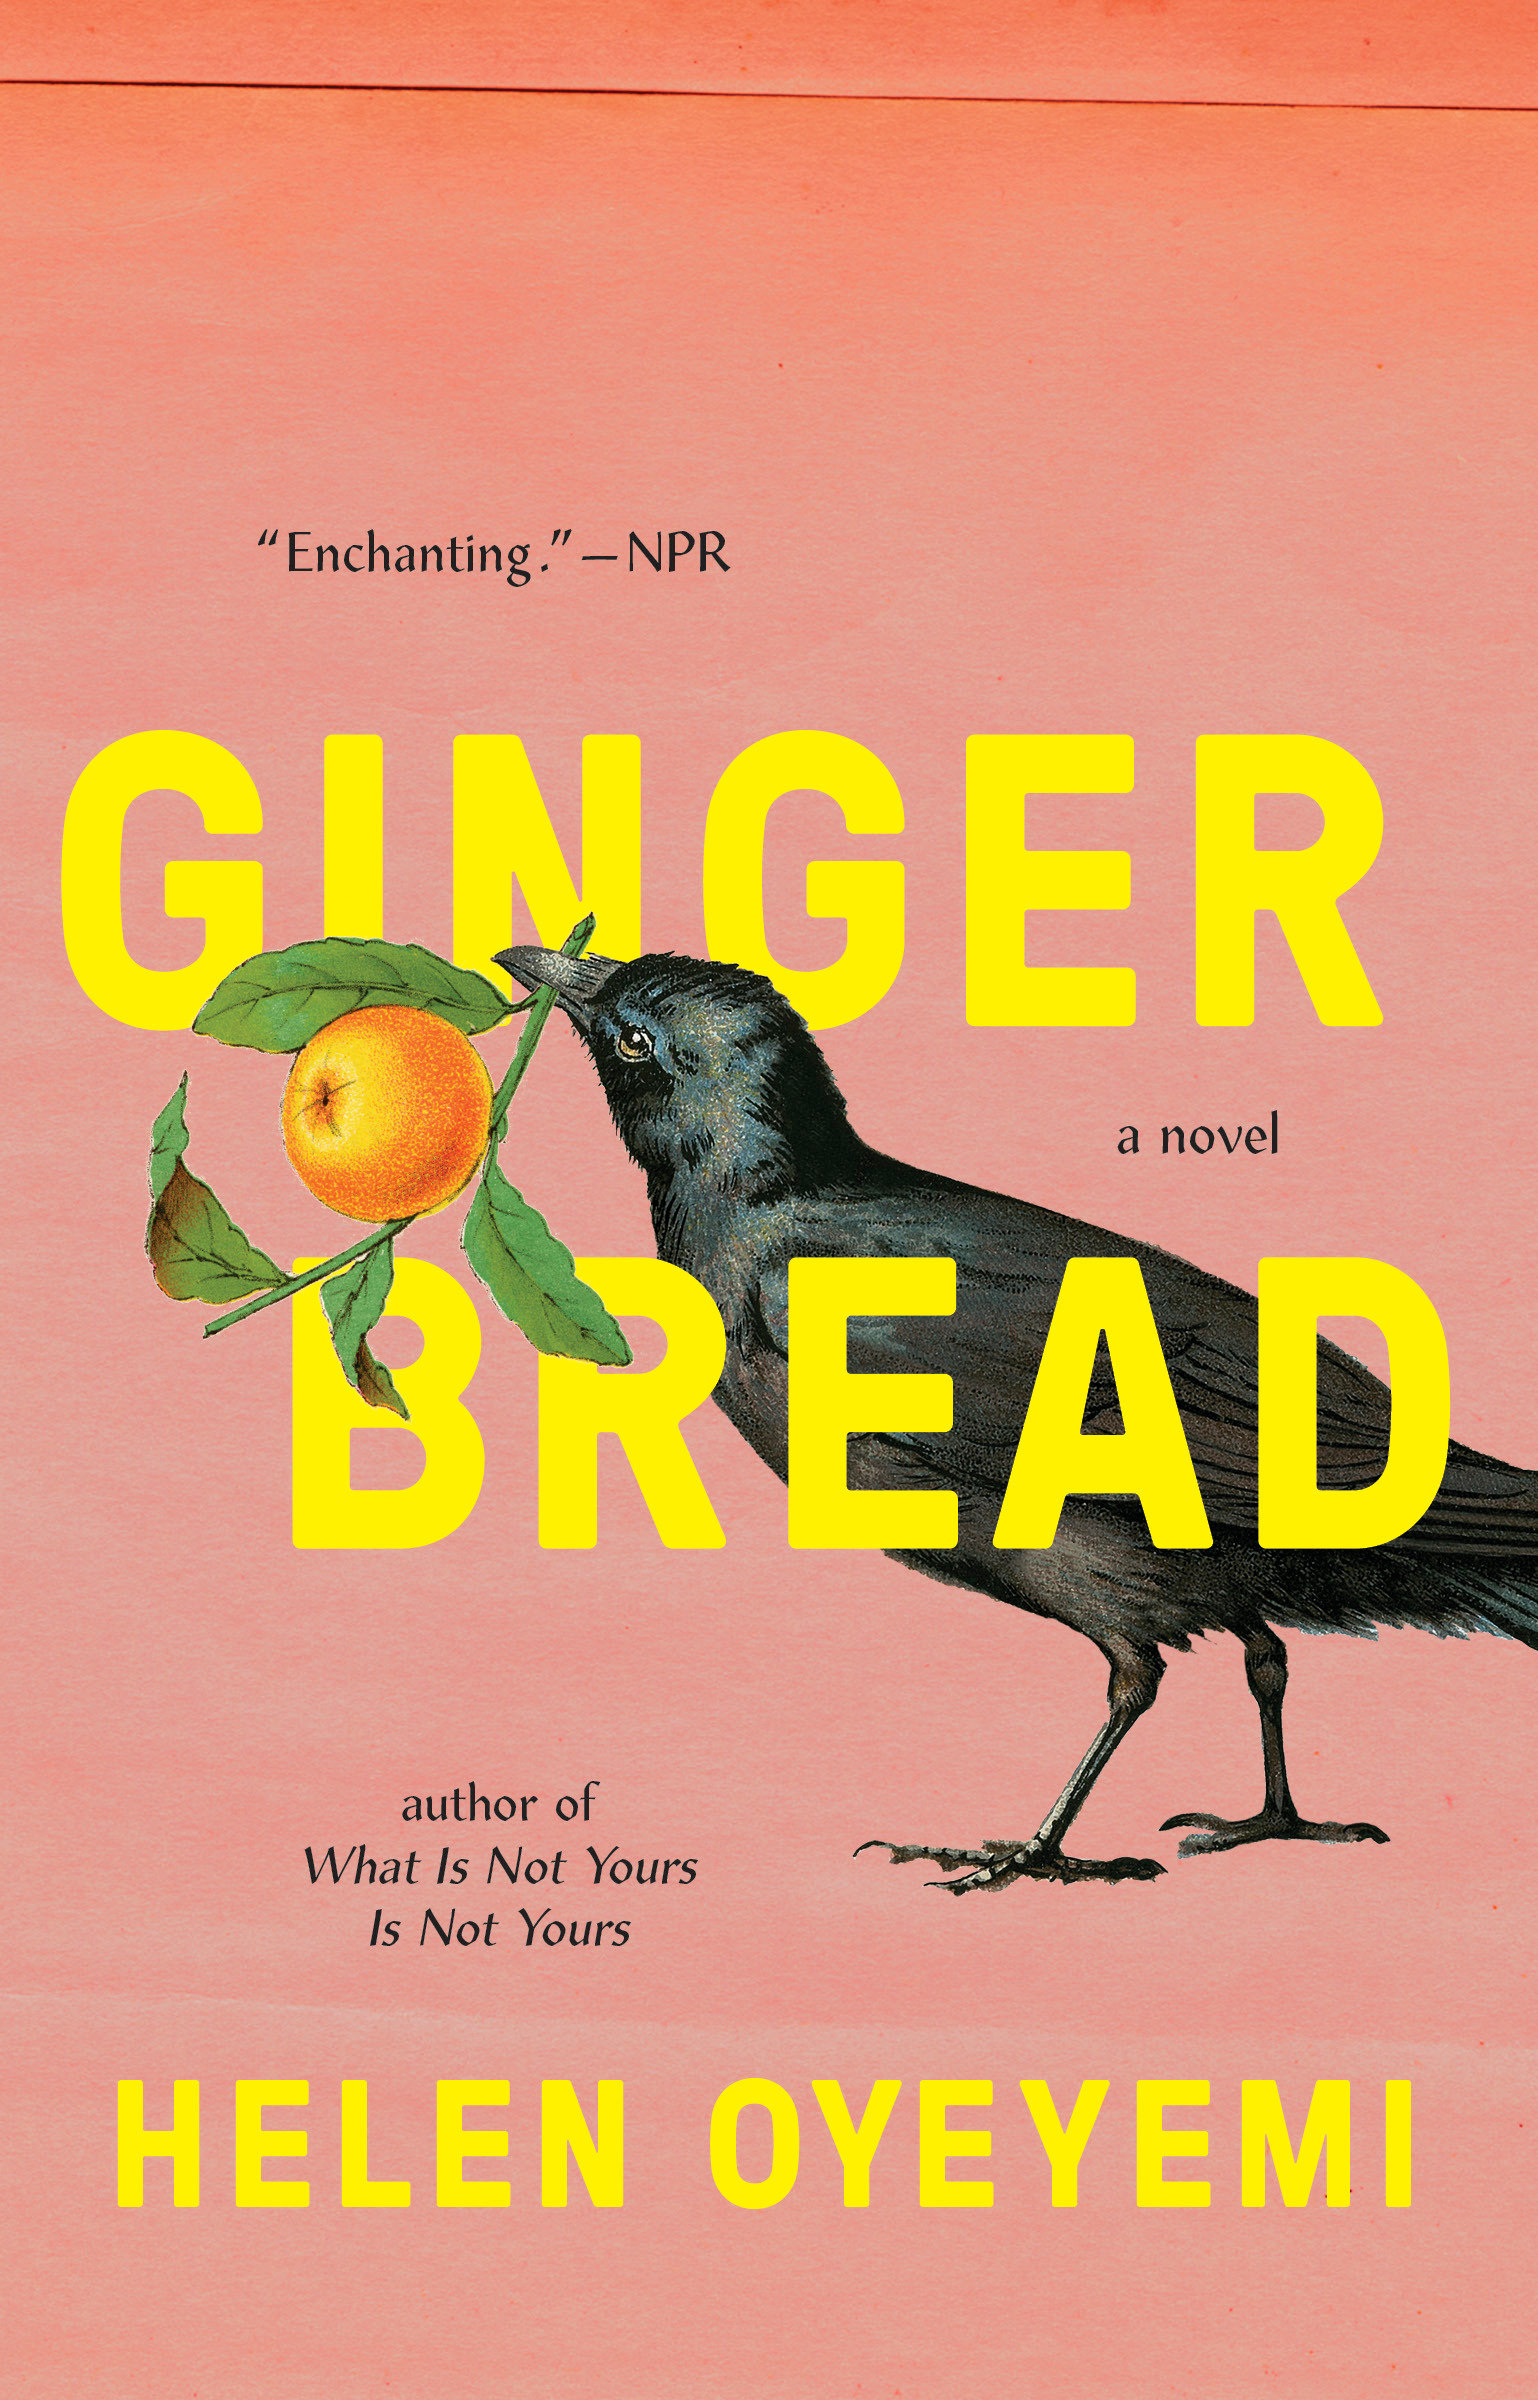 Gingerbread A Novel